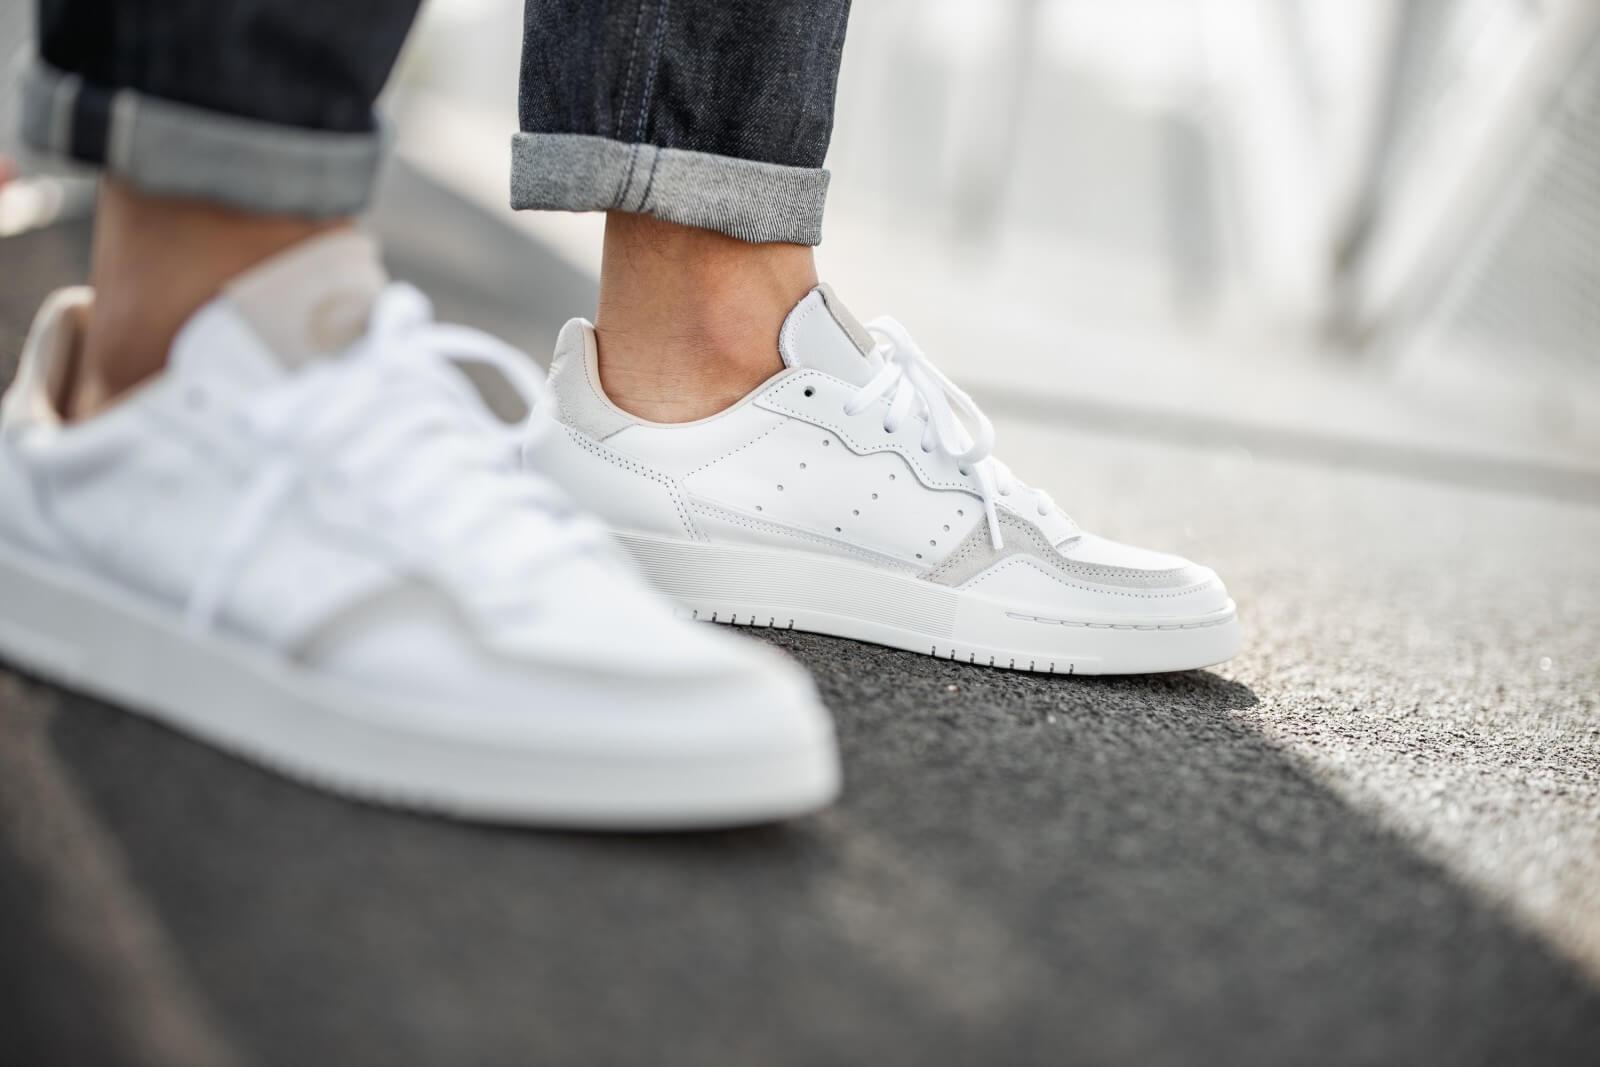 Adidas Supercourt Footwear WhiteCrystal White EE6034